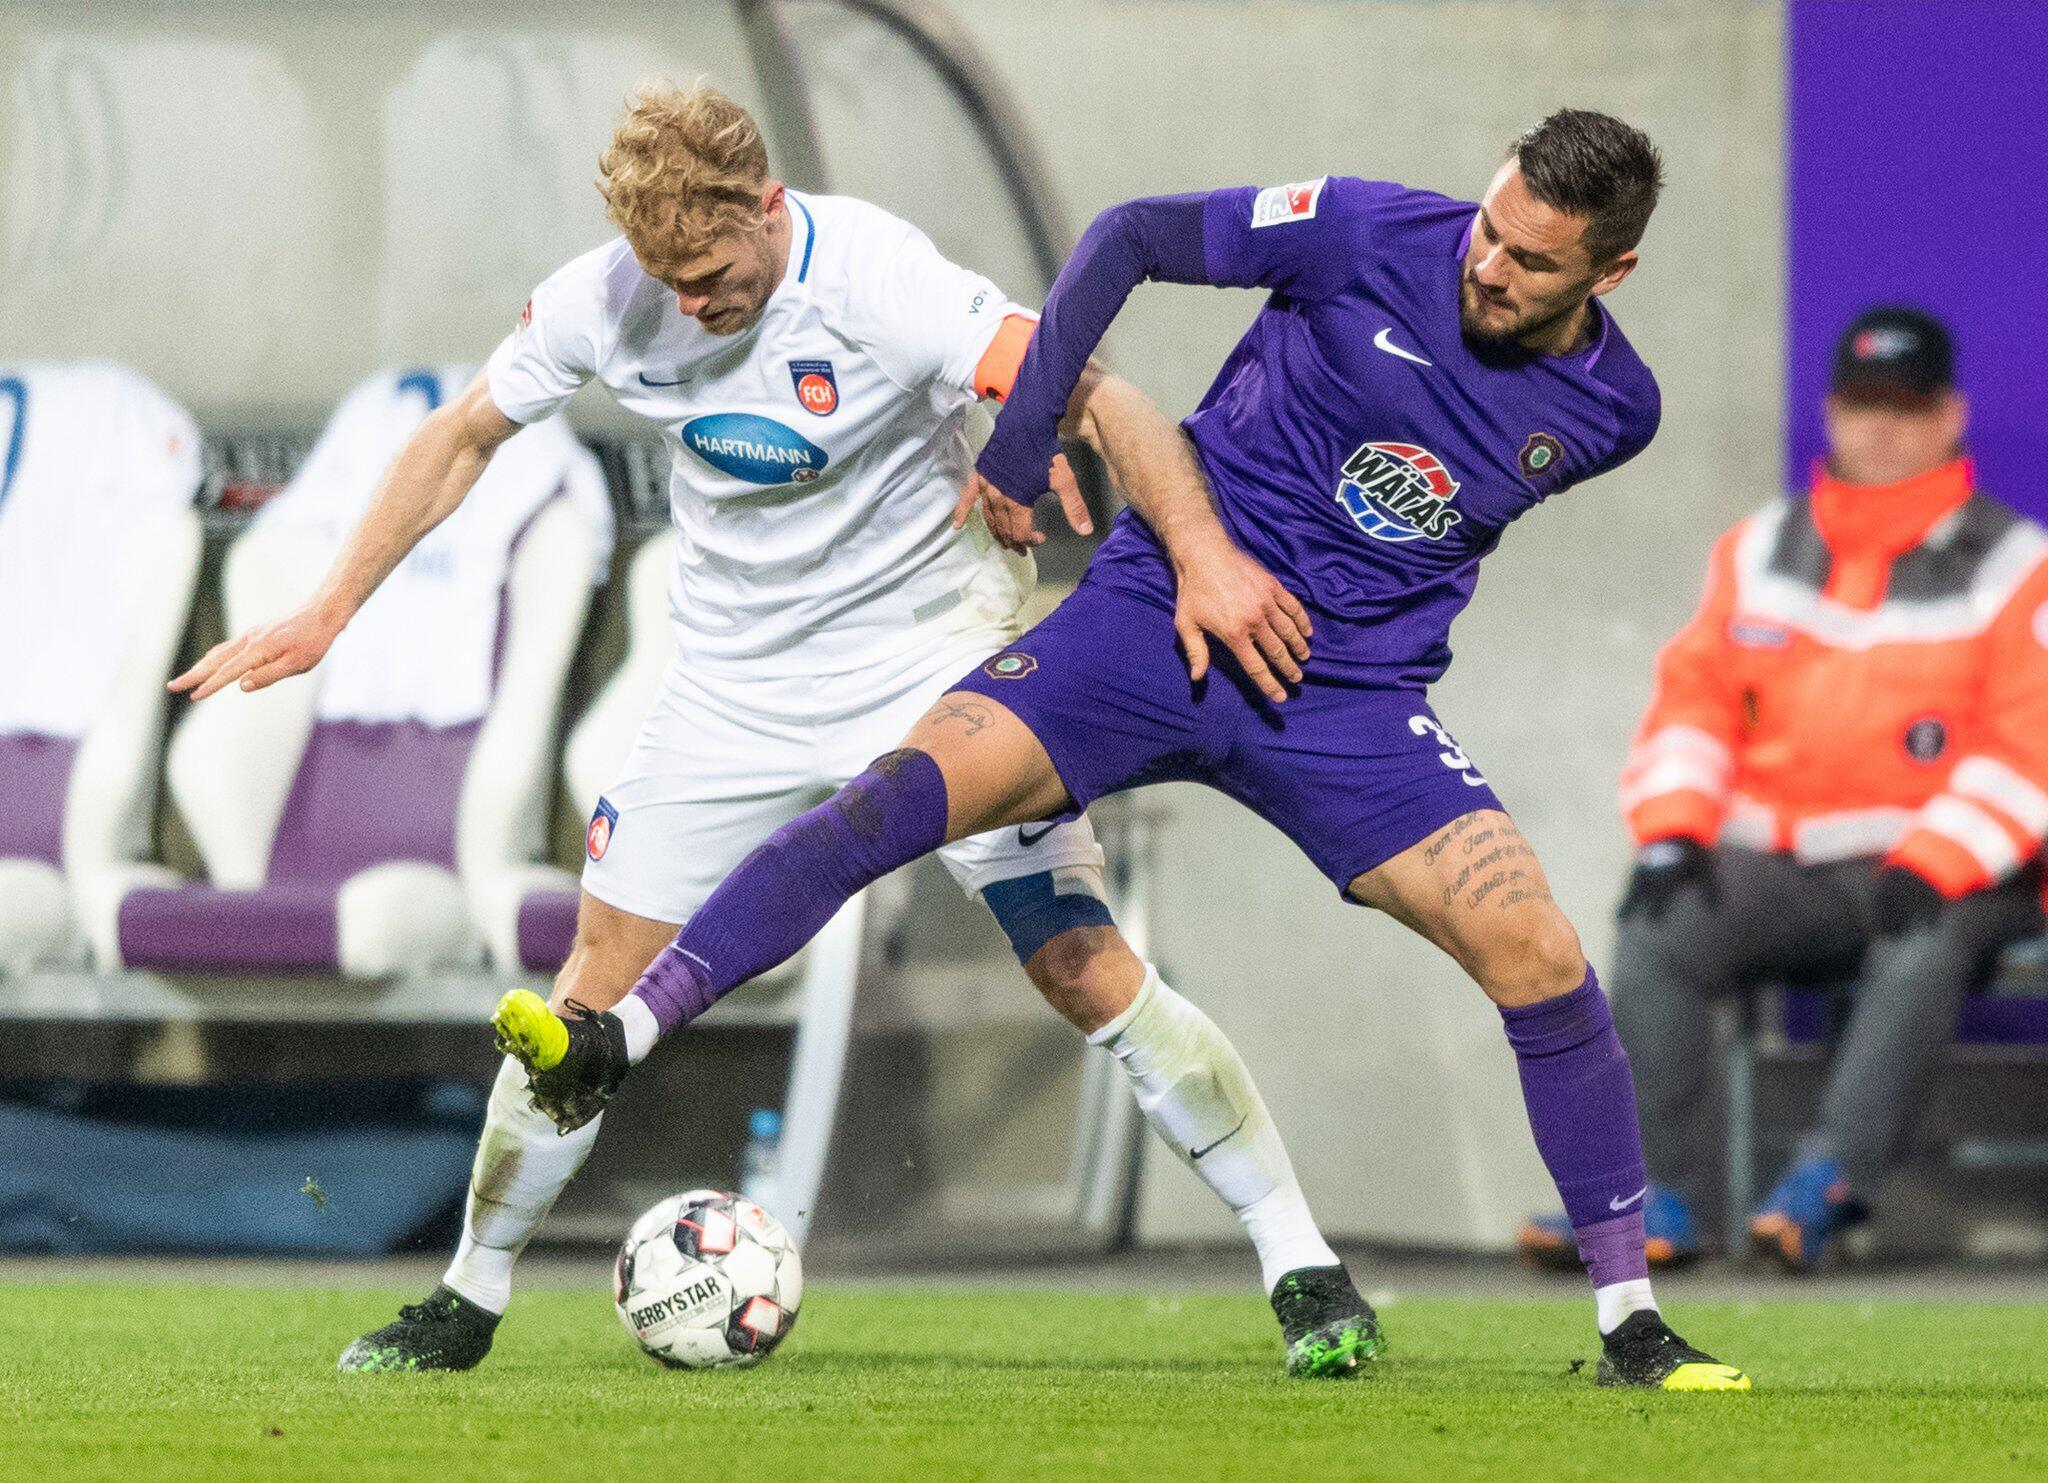 Хайденхайм — Эрцгебирге Ауэ прогноз и ставка на матч